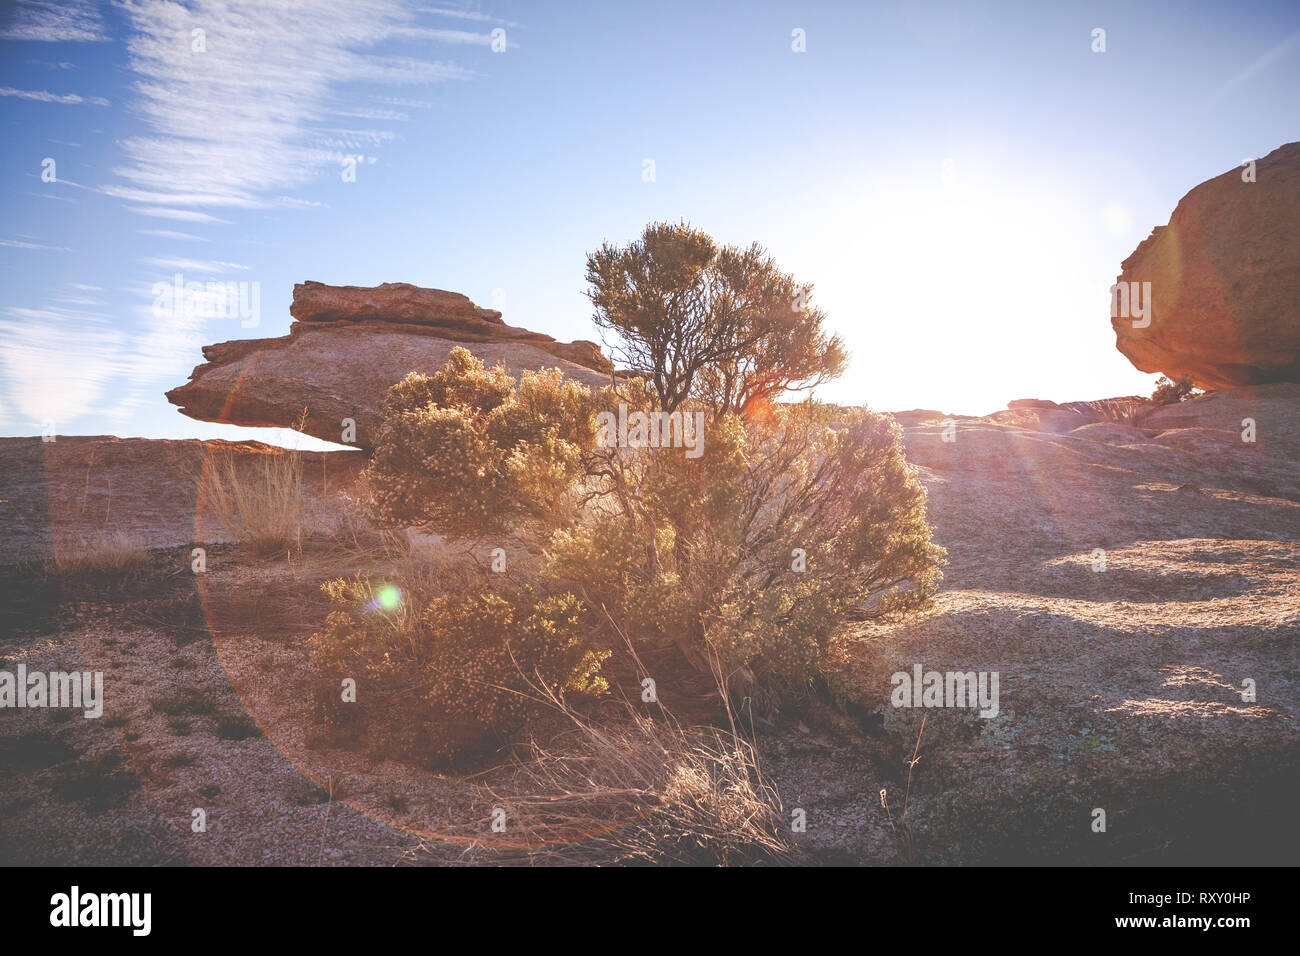 The vast desert landscape of Arizona gleams in the light of the golden sun. - Stock Image